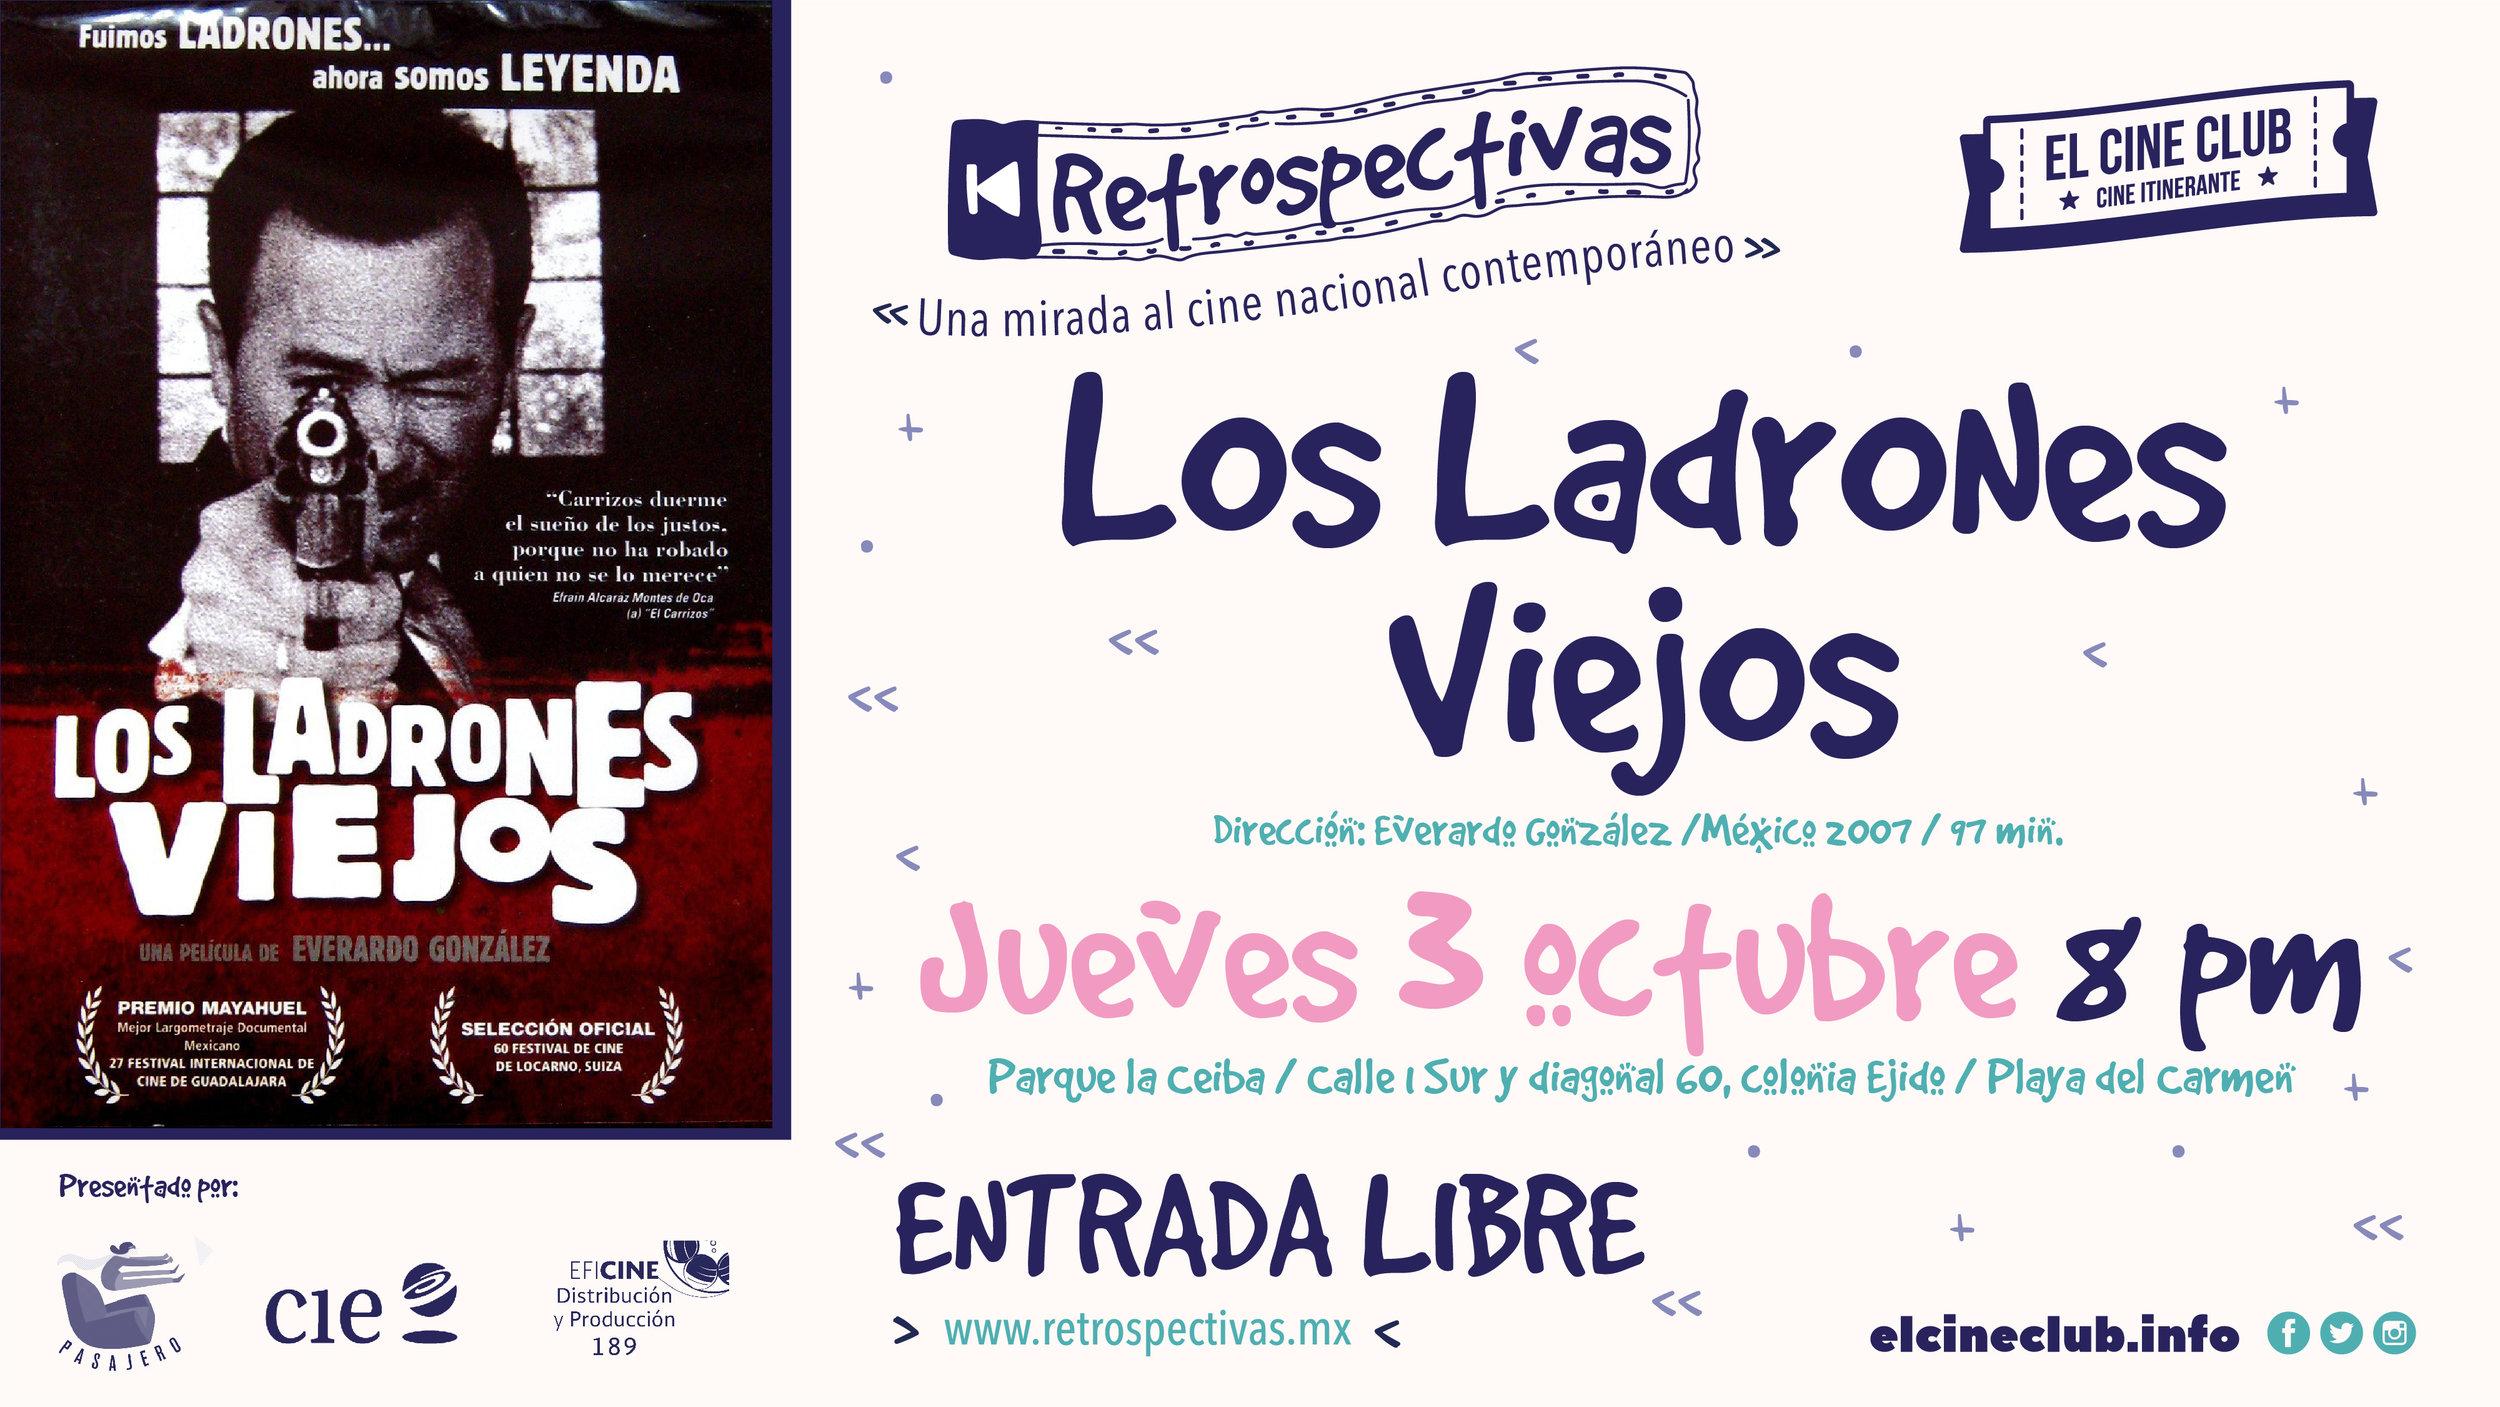 05_Ladrones_Viejos-05.jpg